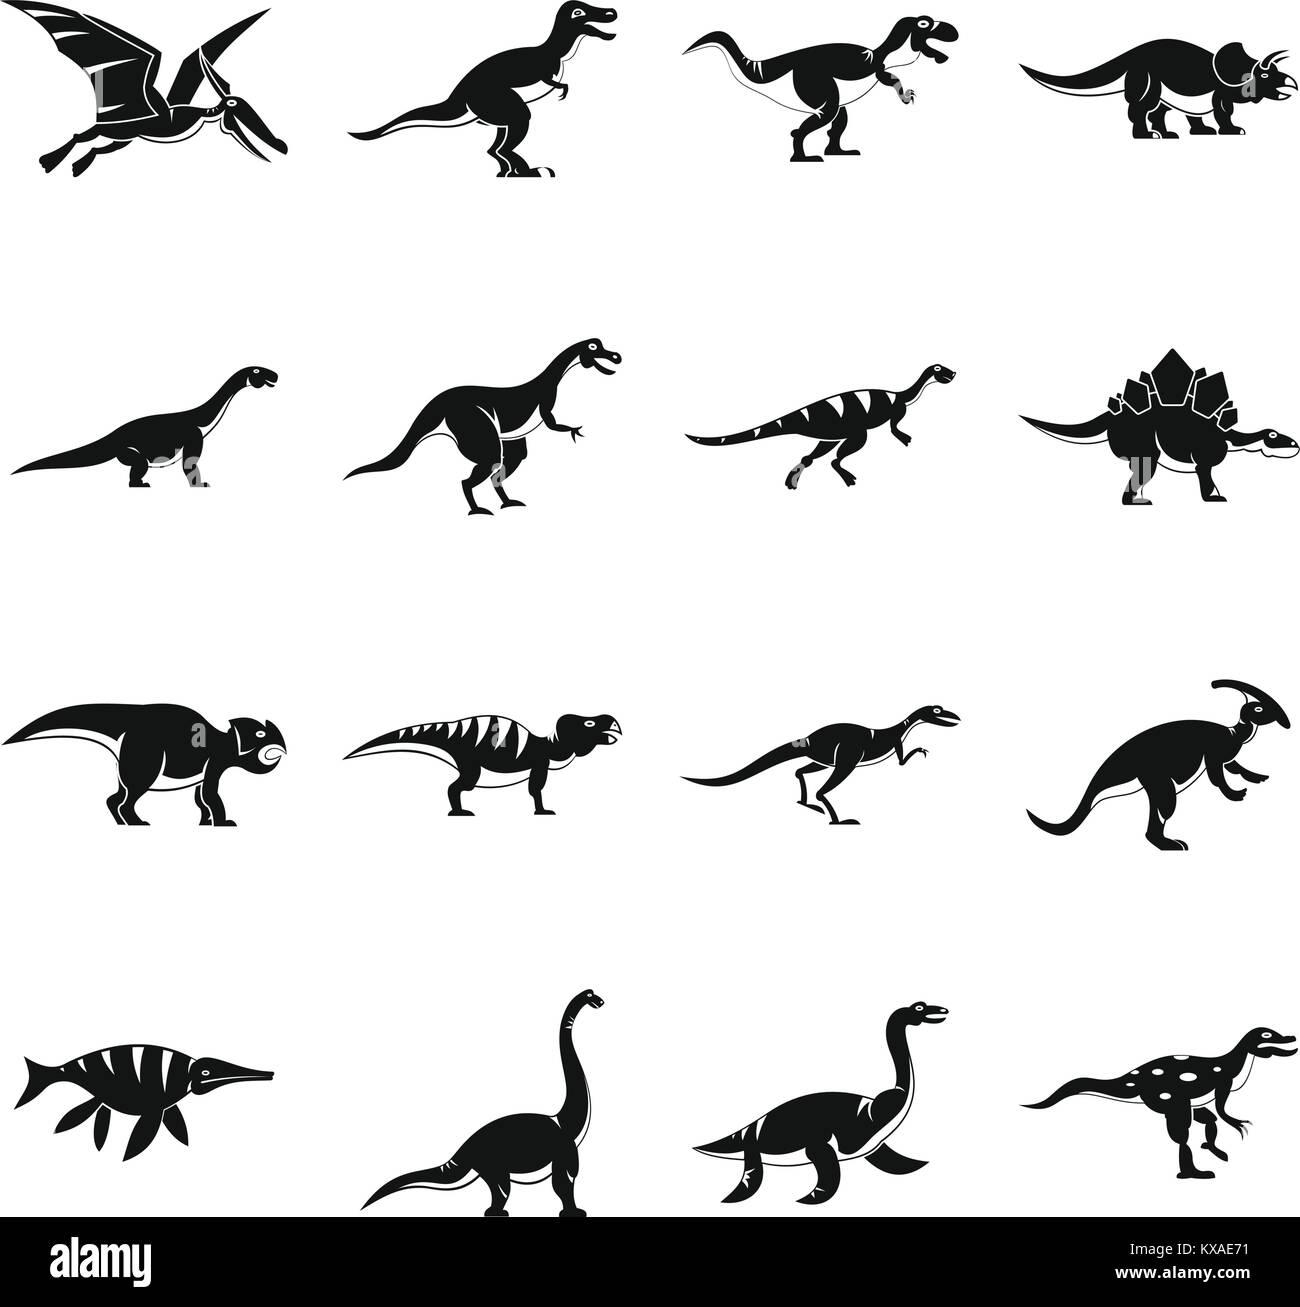 Dinosaur icons set, simple style - Stock Image